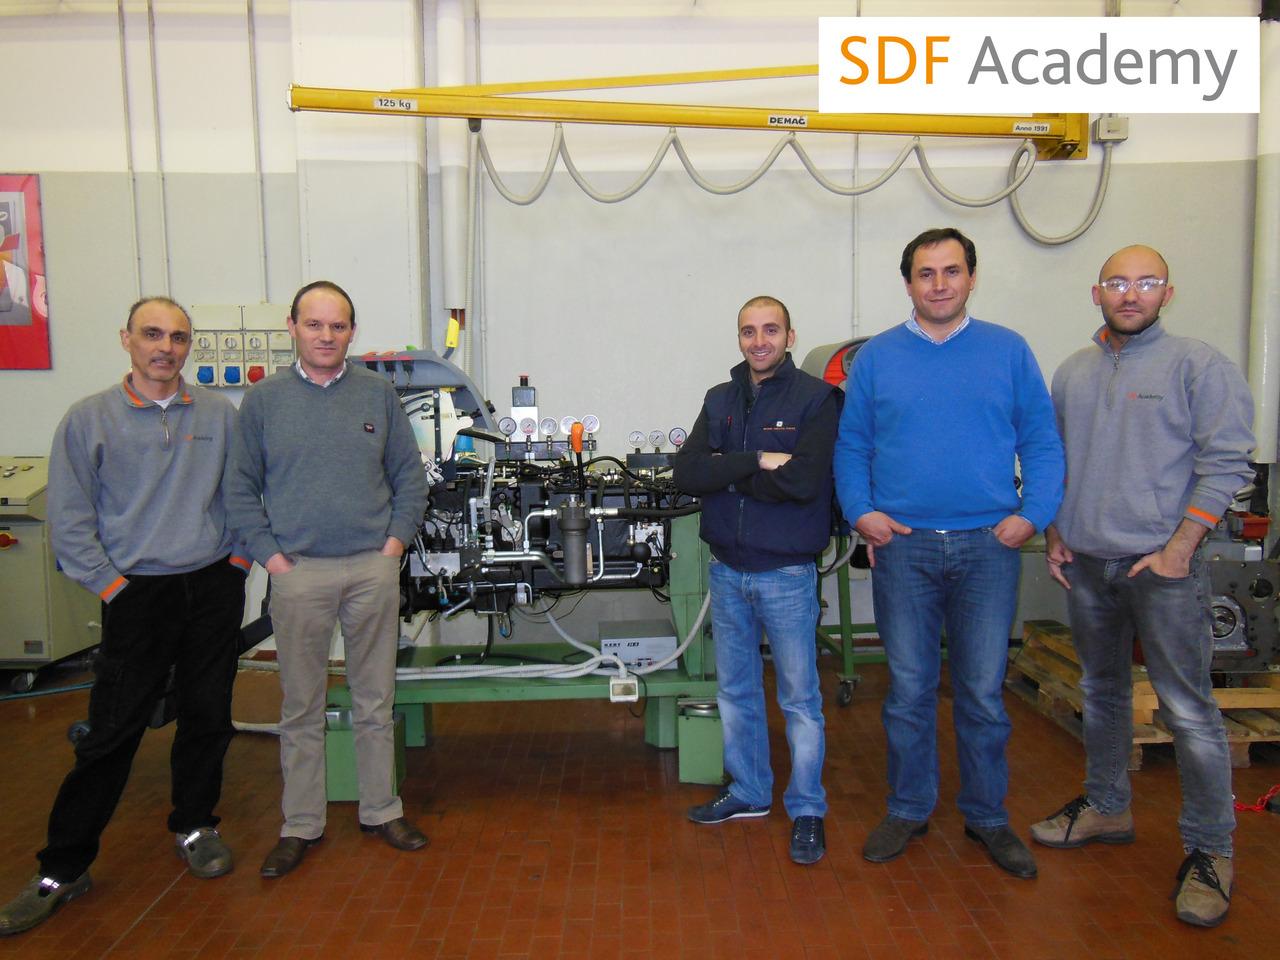 SDF Academy - Corso con tecnici portoghesi